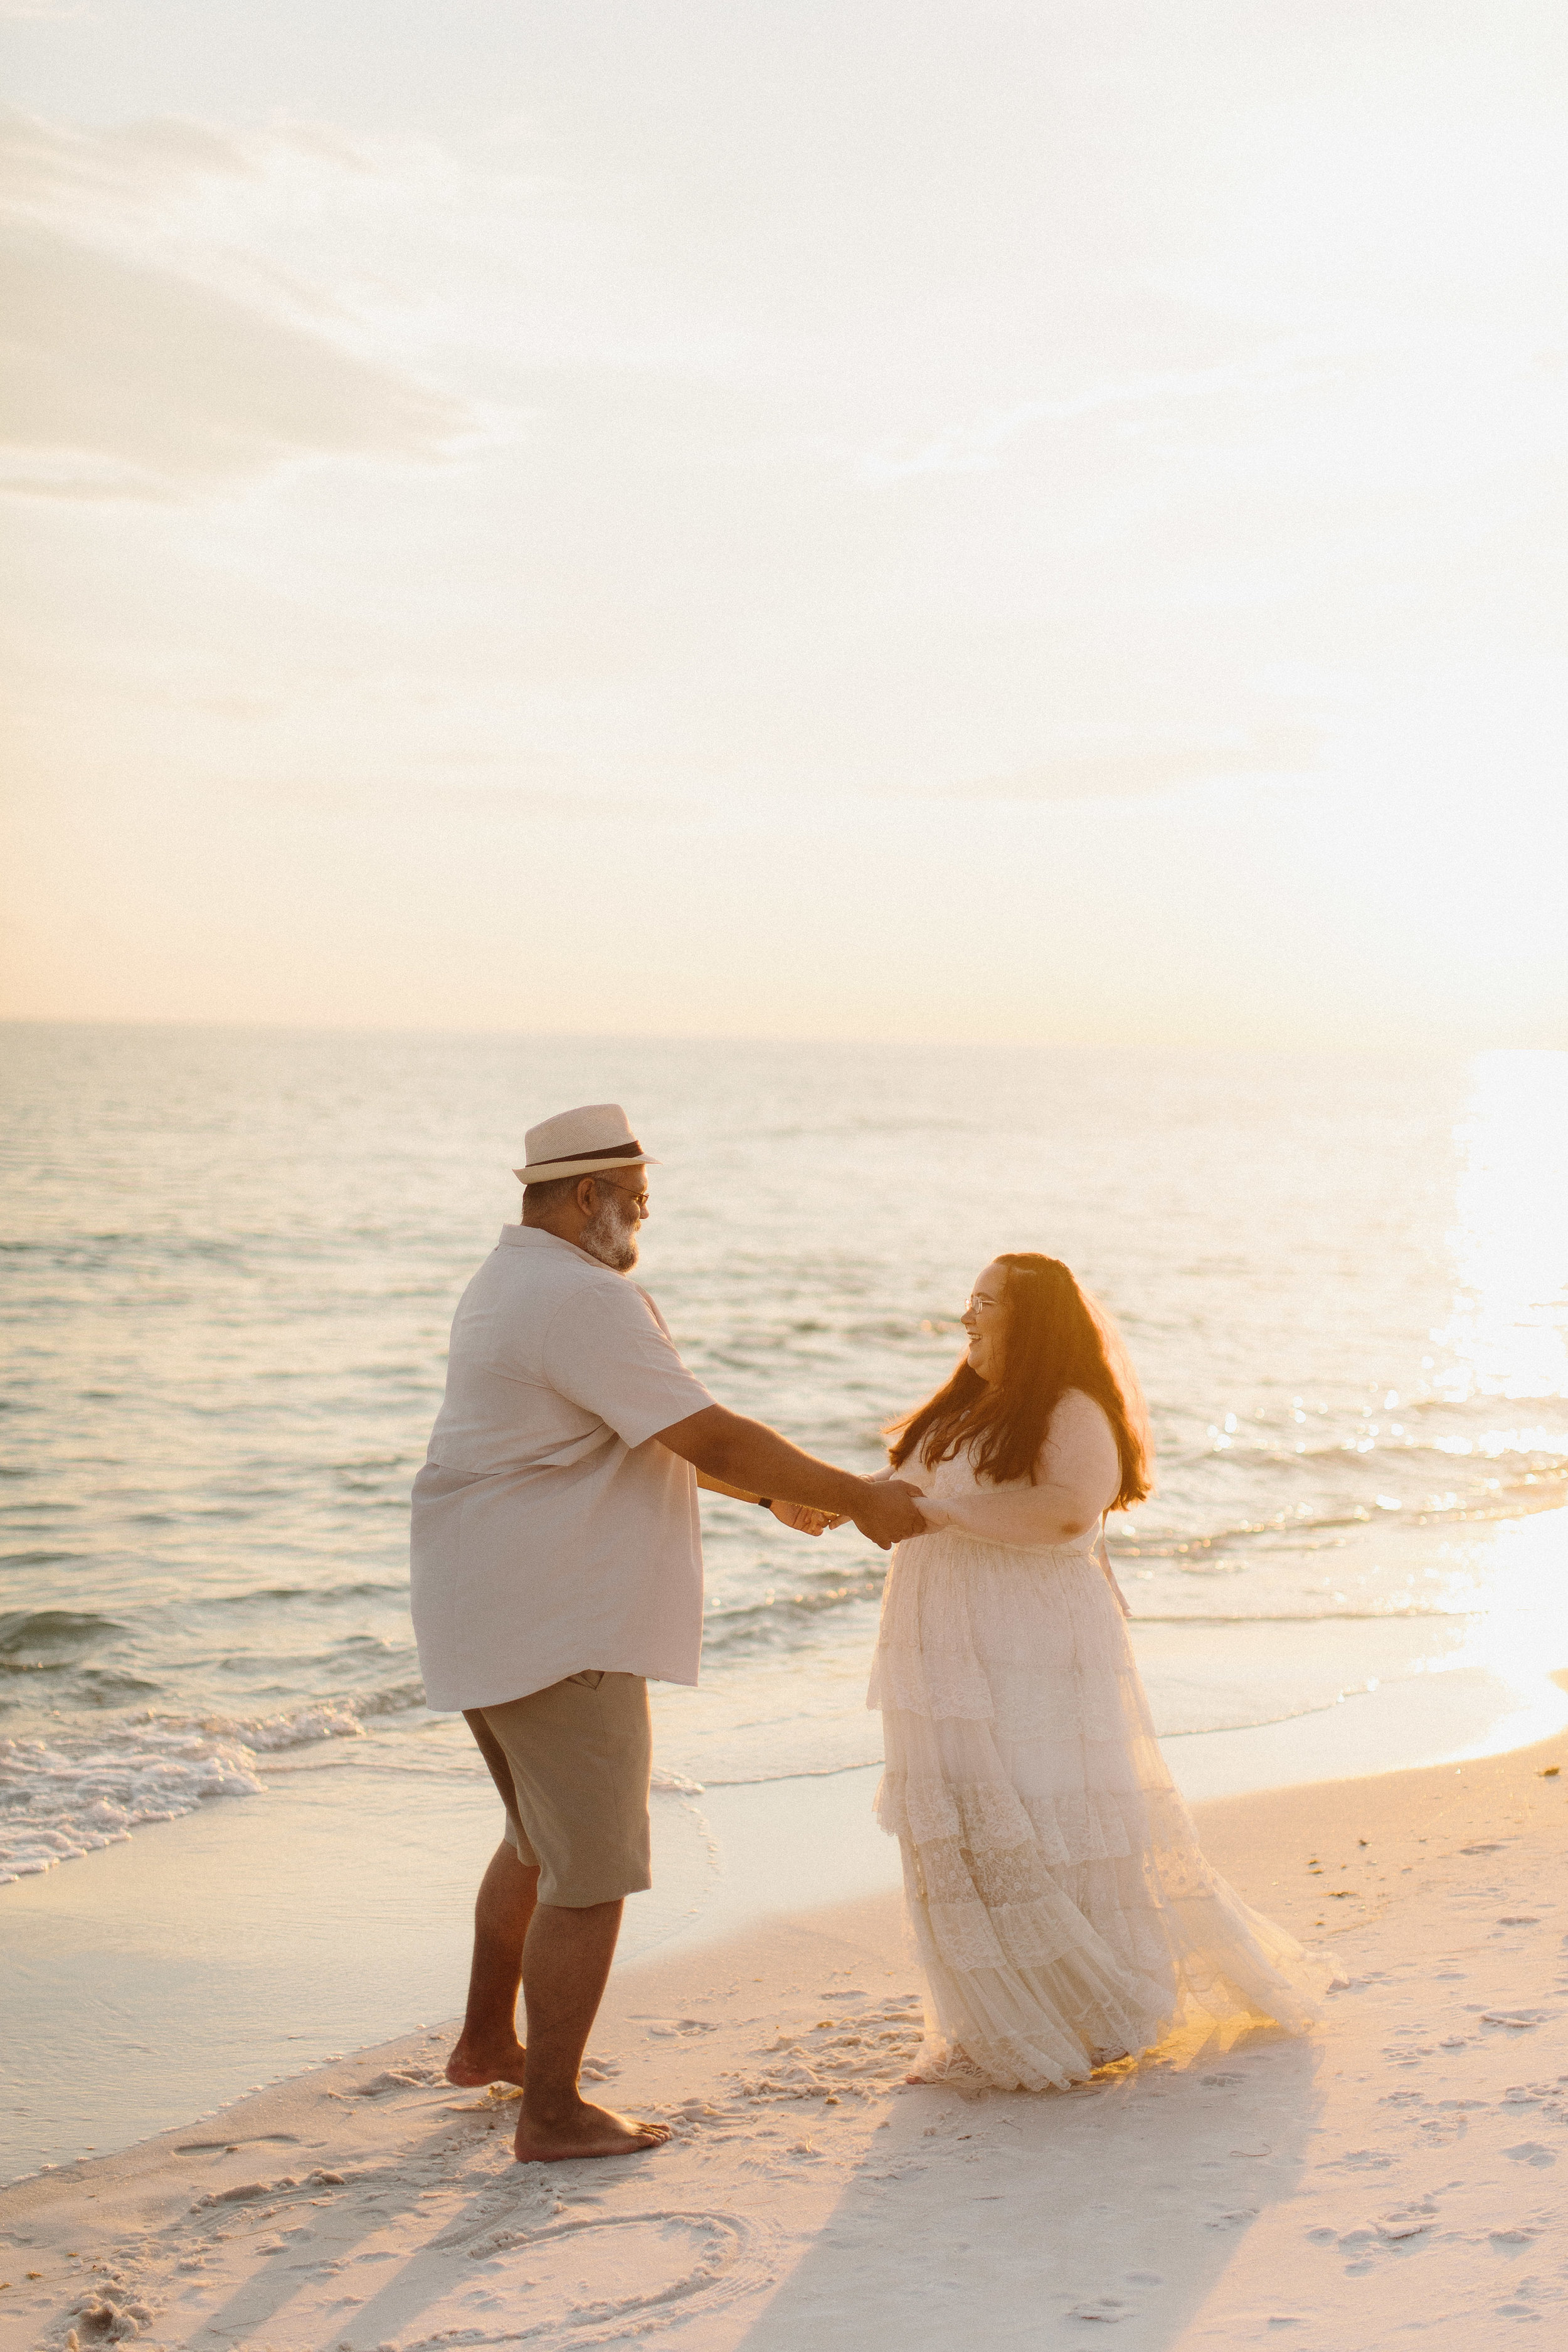 destin_sunset_beach_elopement_intimate_wedding_photographer_florida_documentary_1287.jpg